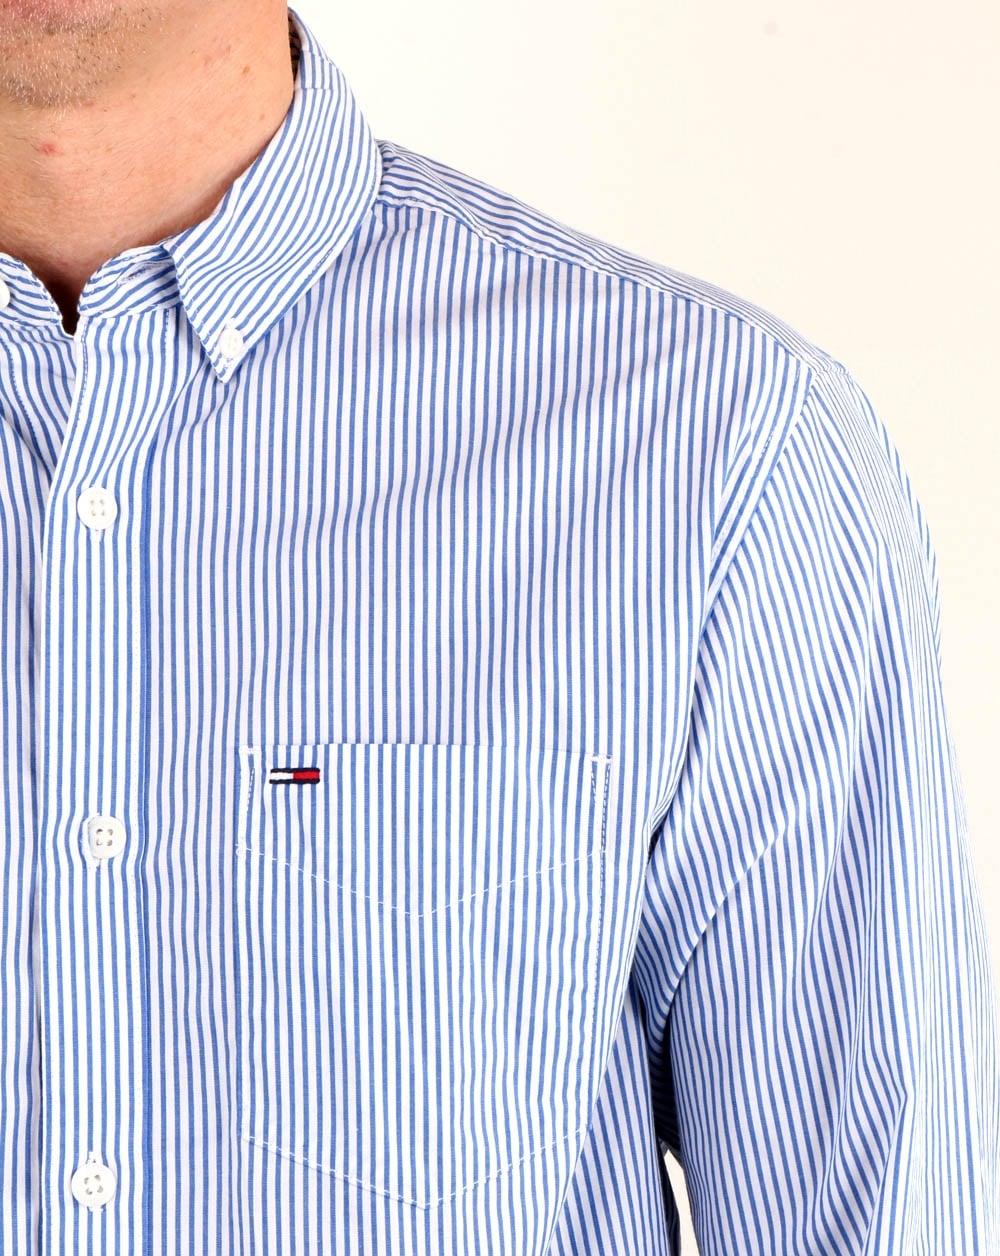 9f8aa2dd Tommy Hilfiger Classic Stripe Shirt White/Blue | 80s casual classics